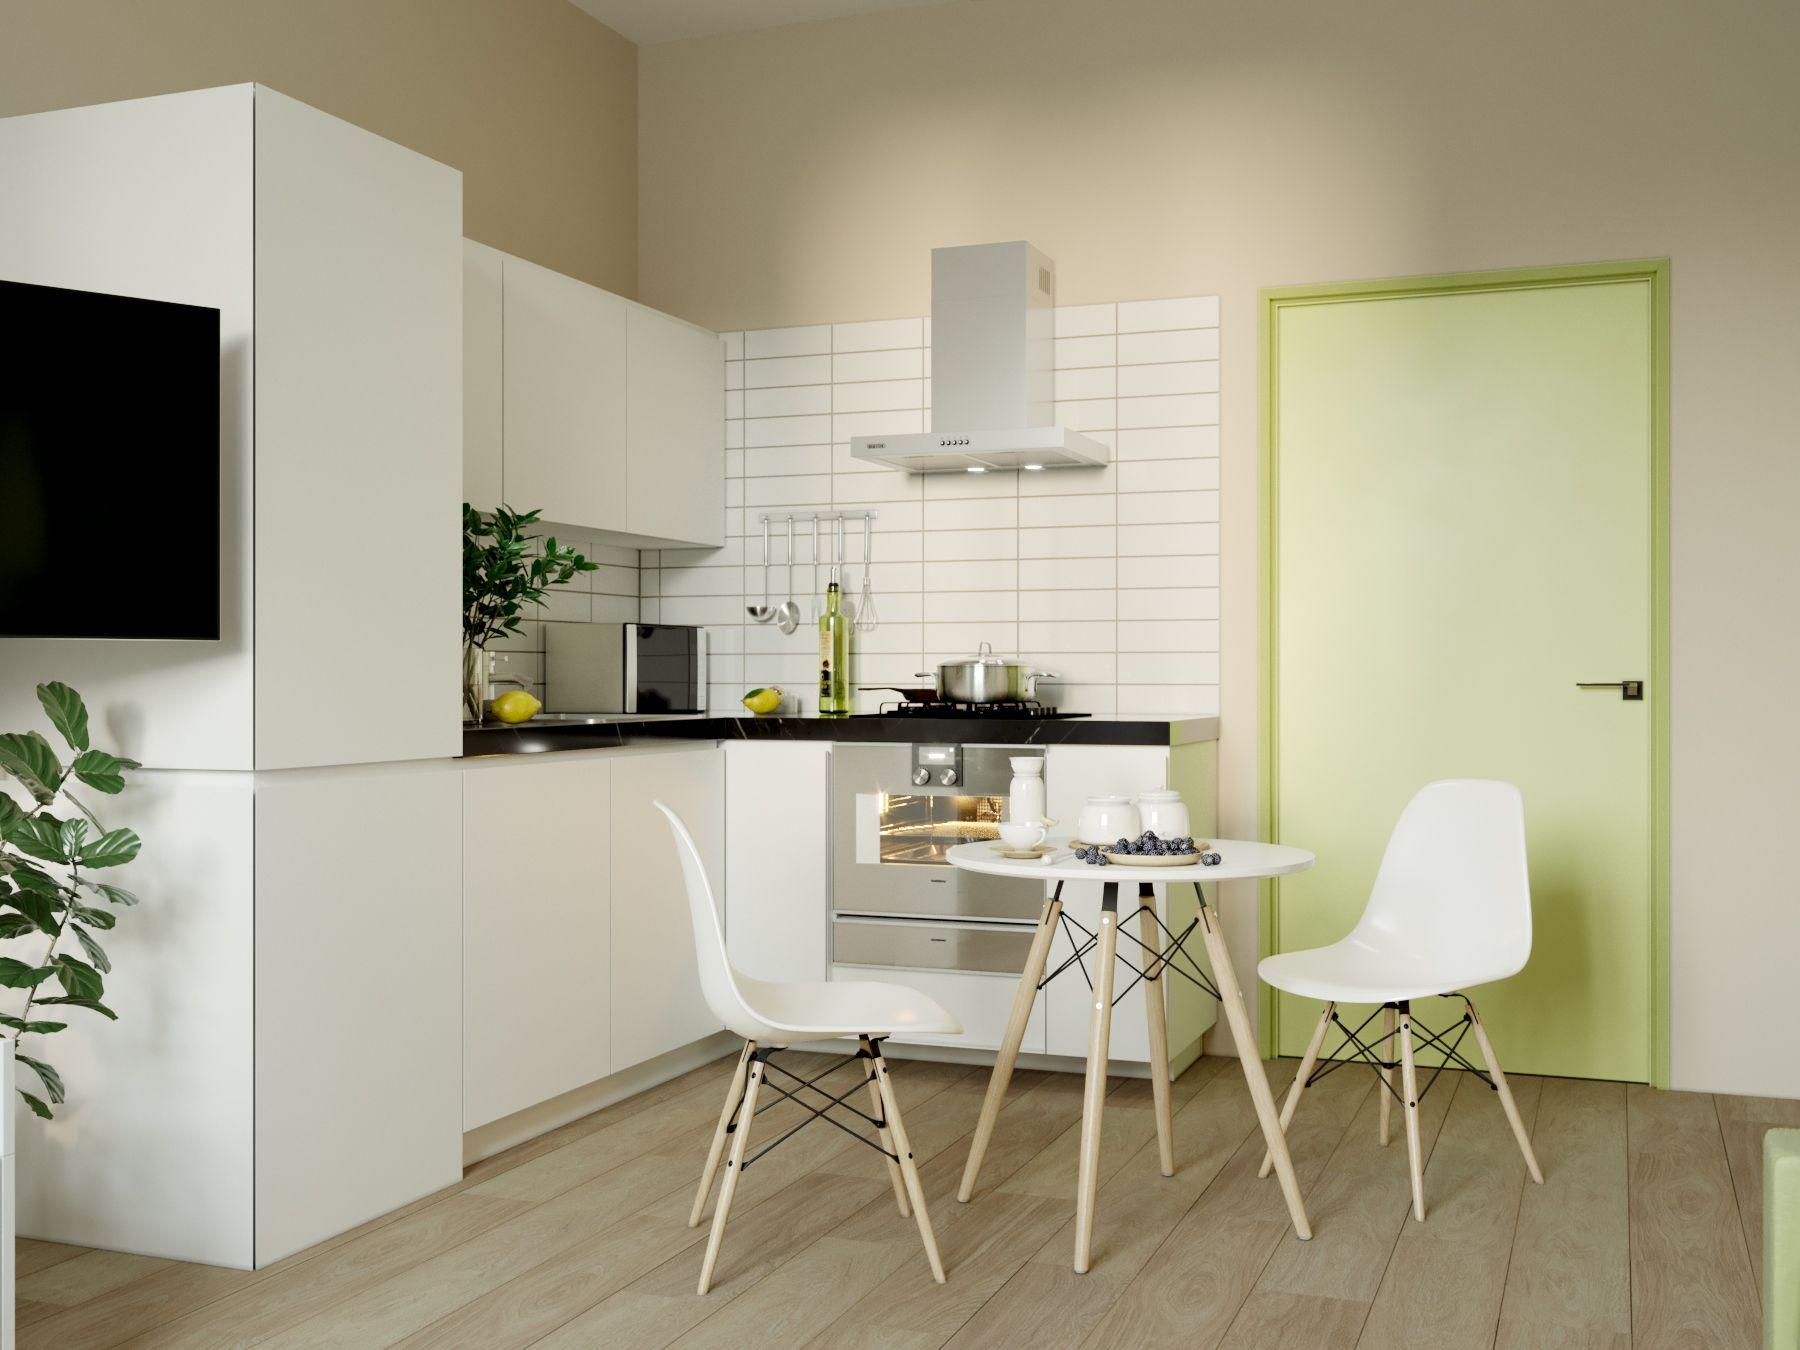 #Designbureaudesense #Saintpetersburg #Medicalcenter #Ward #Colours #Green #White #Light